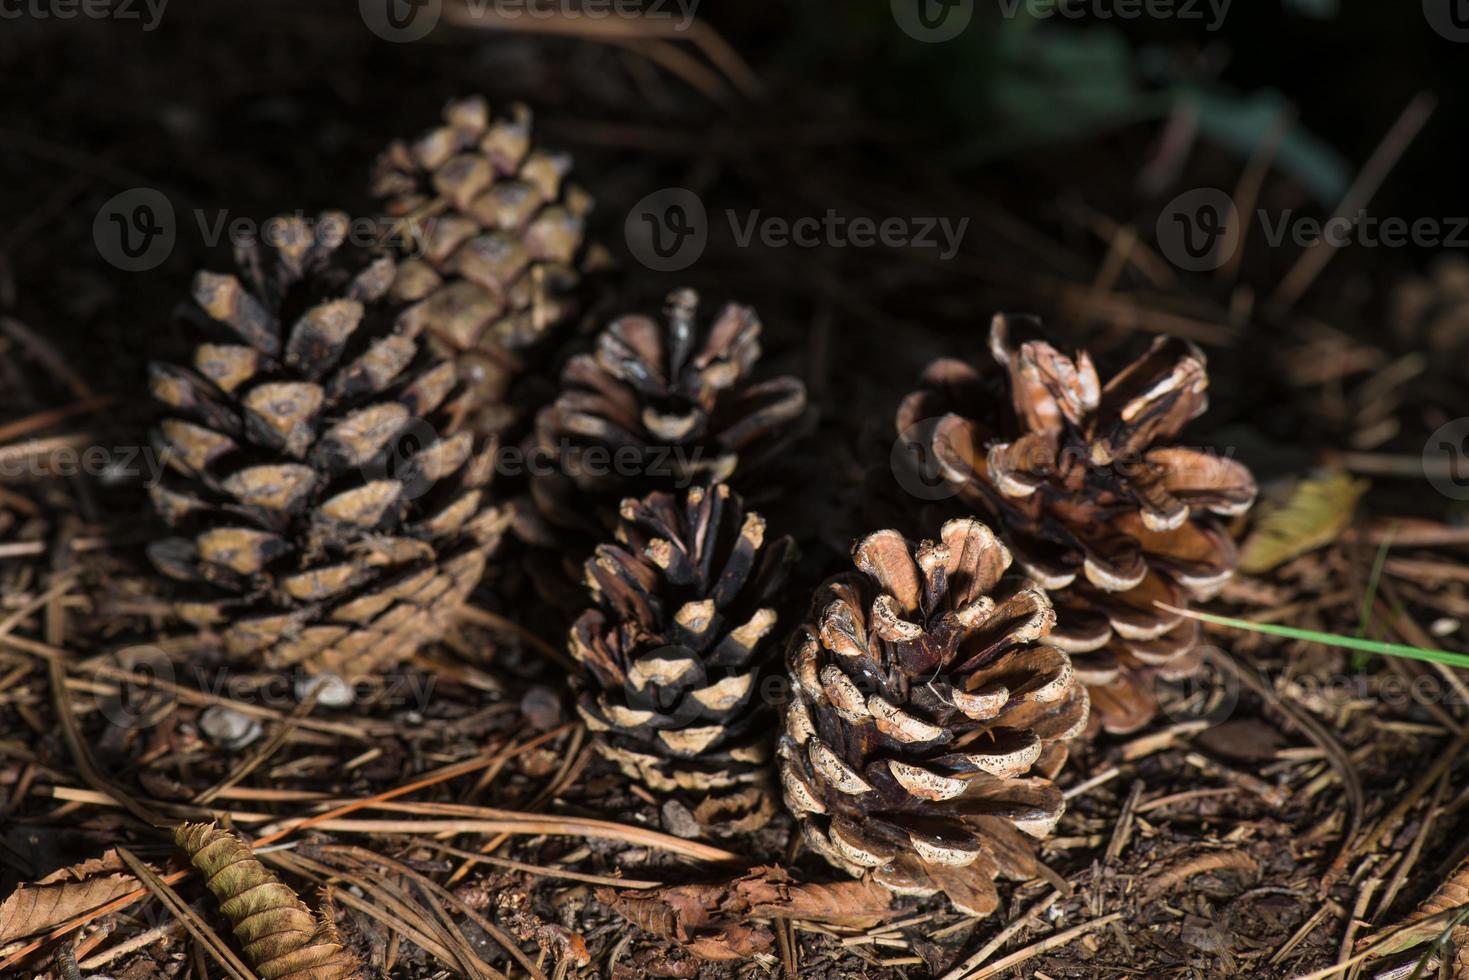 piñas en la madera en otoño foto